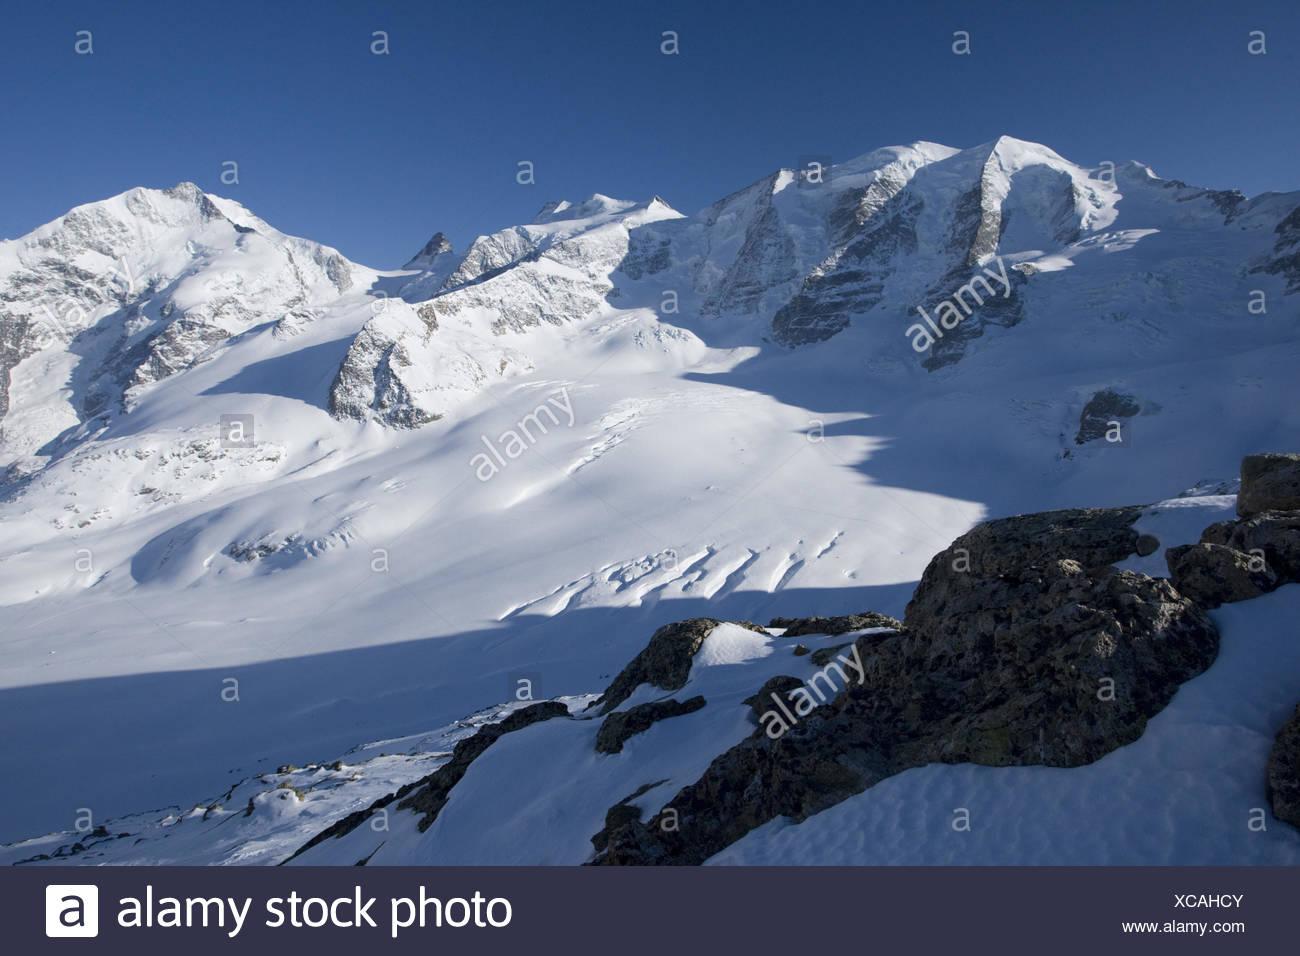 Switzerland, the Engadine, Bernina group, Diavolezza, view, Piz Palü, - Stock Image